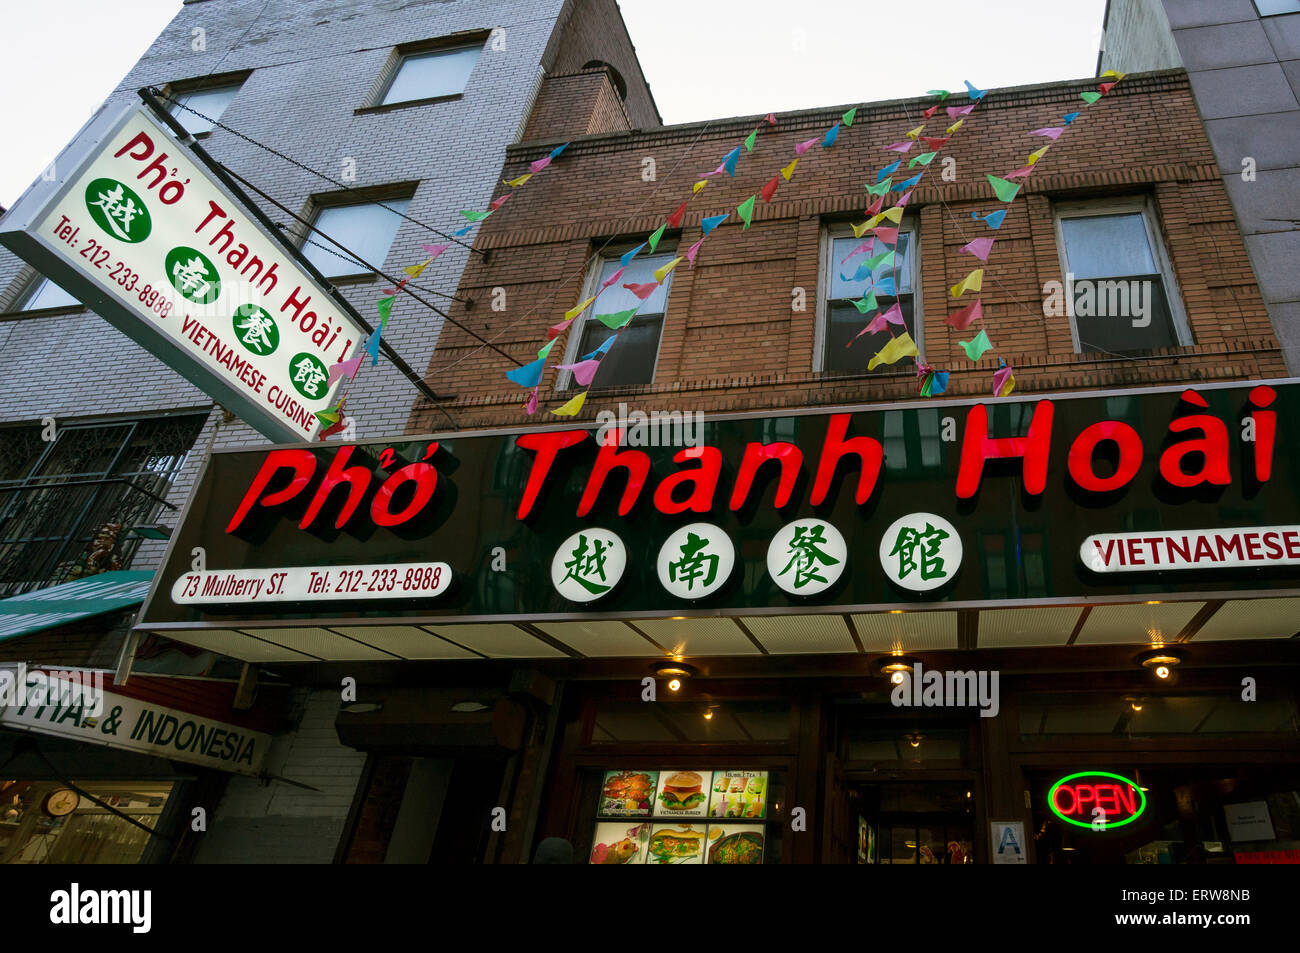 Pho Thanh Hoai A Vietnamese Restaurant On Mulberry Street